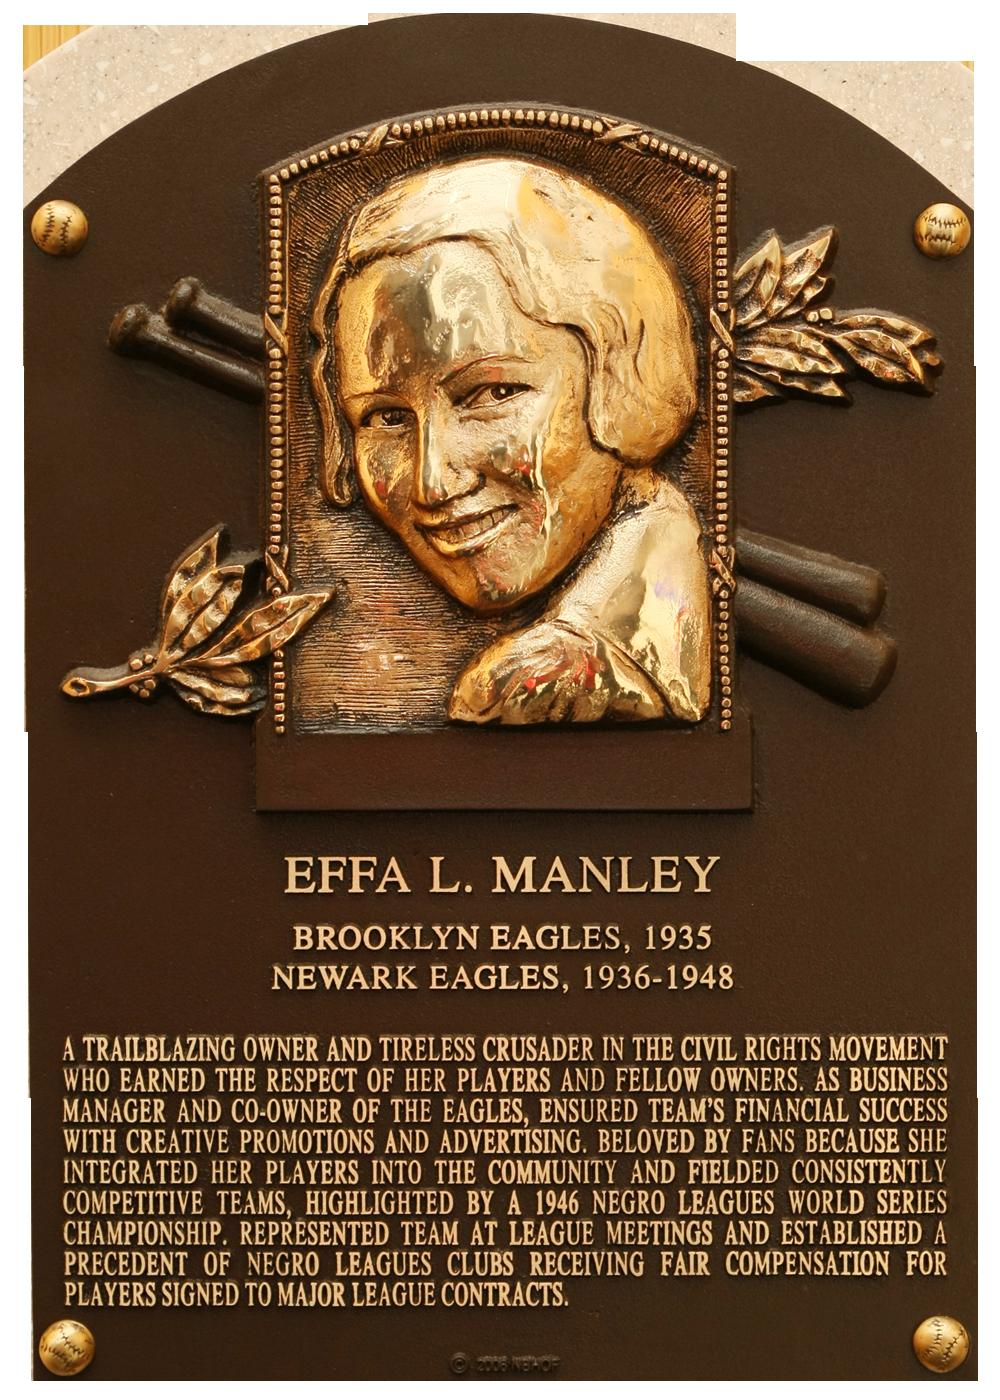 http://baseballhall.org/sites/default/files/Manley%20Effa%20Plaque_NBL_0.png